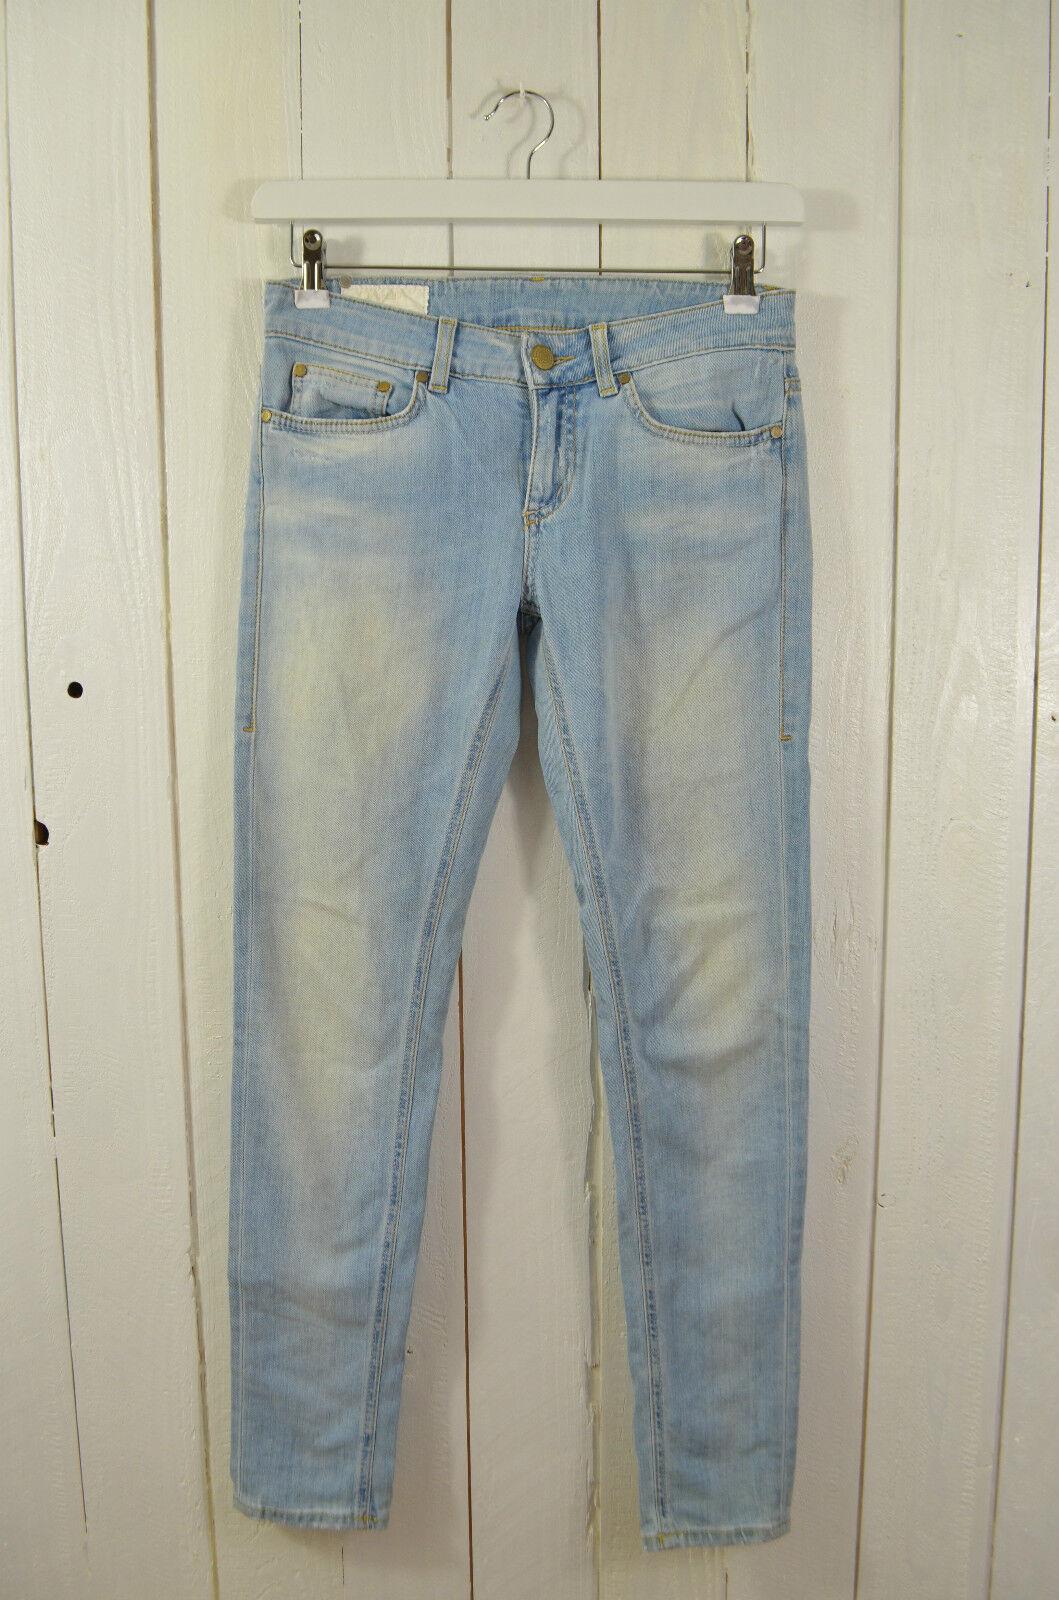 DUNDOP Jeans Damen Jeans Schmal Mod.Longleg Waschung schwarzjacks Hellblau Gr.28